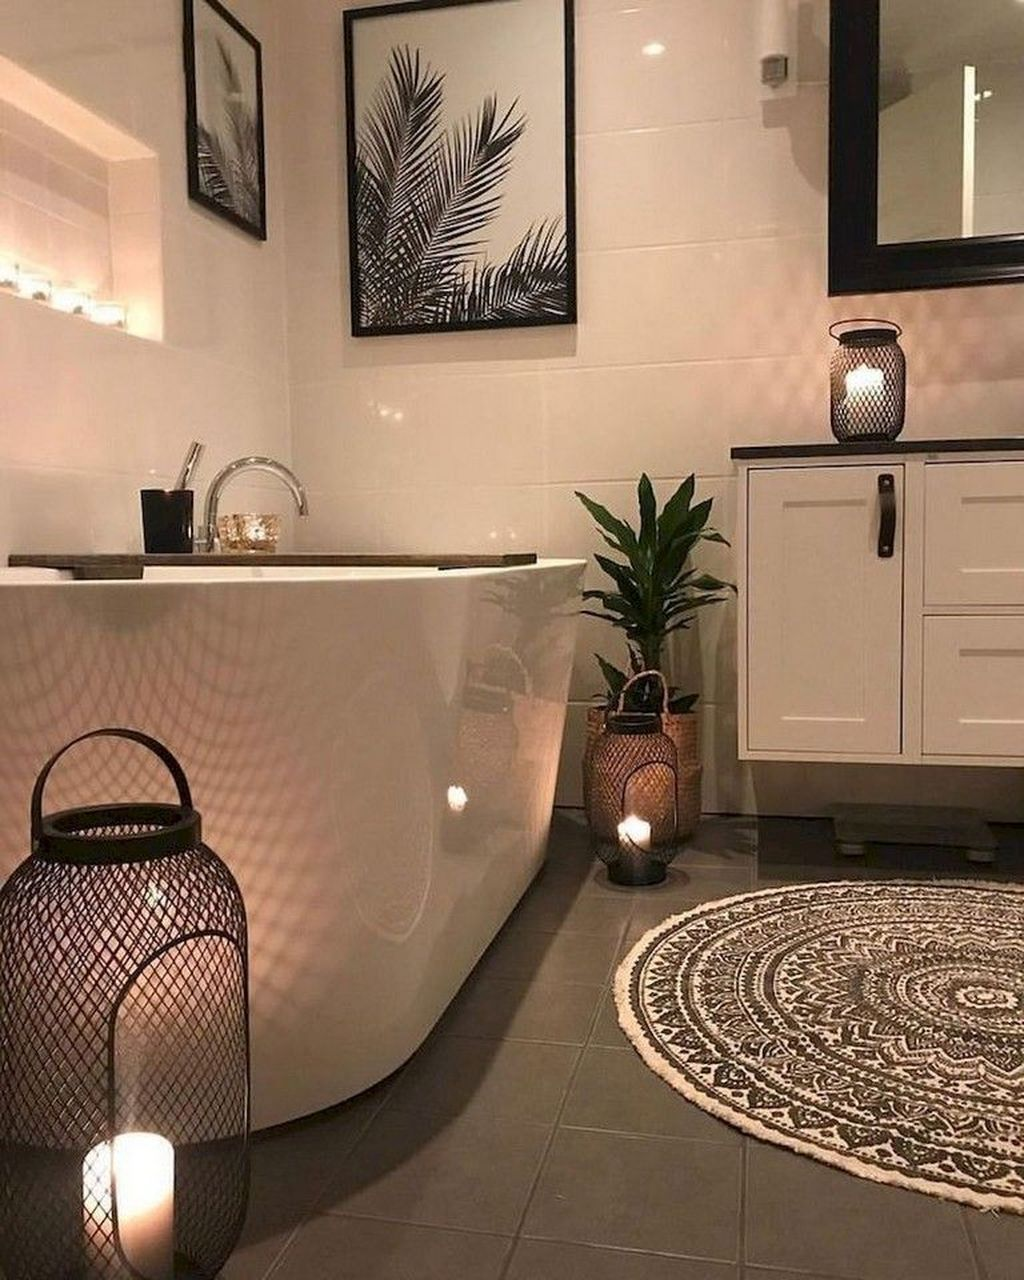 45 Relaxing Bathroom Decor Ideas For Your Bathroom Look Cool